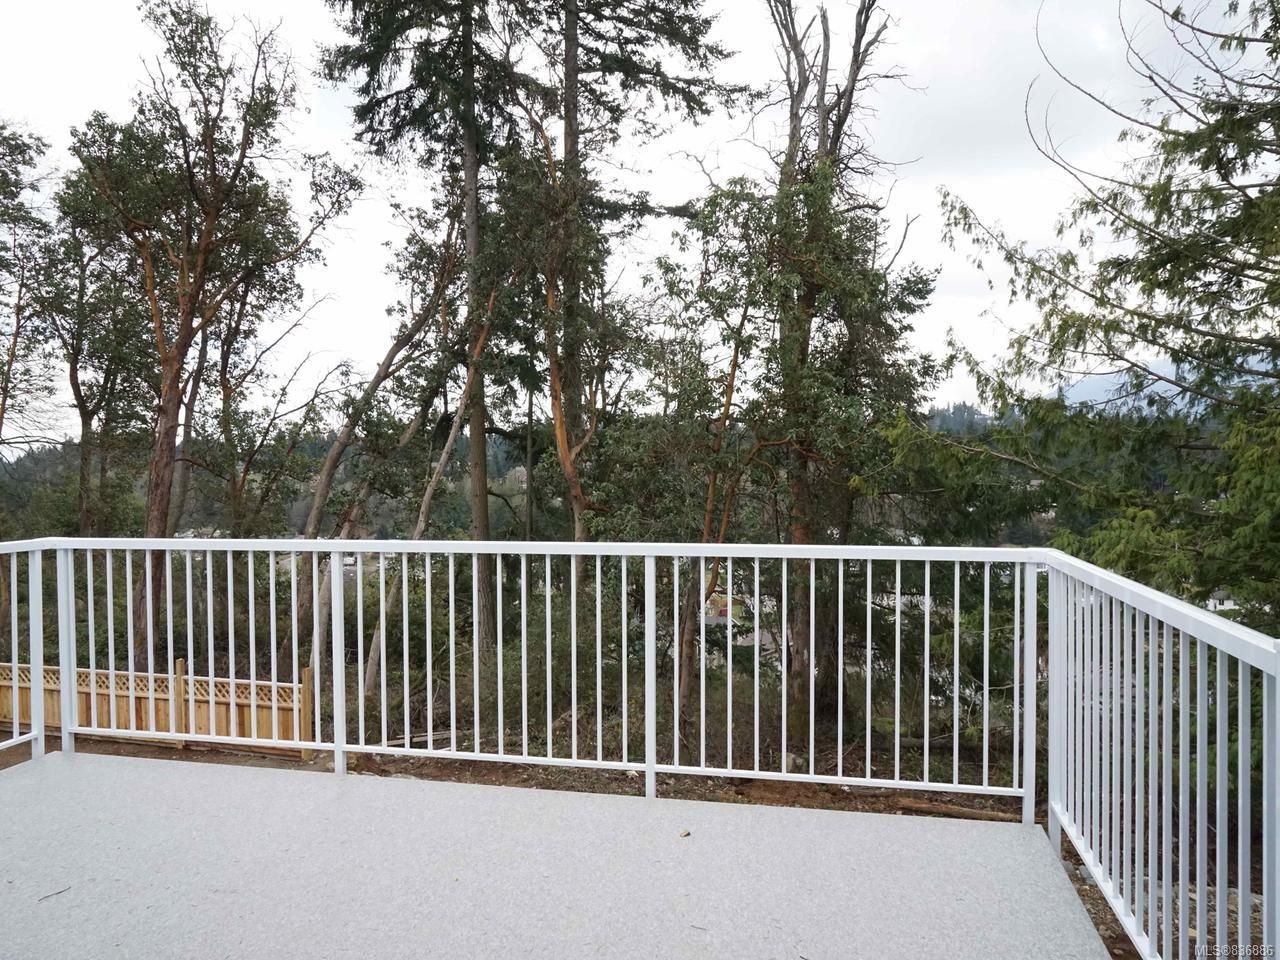 Photo 6: Photos: 123 Lindquist Rd in NANAIMO: Na North Nanaimo House for sale (Nanaimo)  : MLS®# 836886